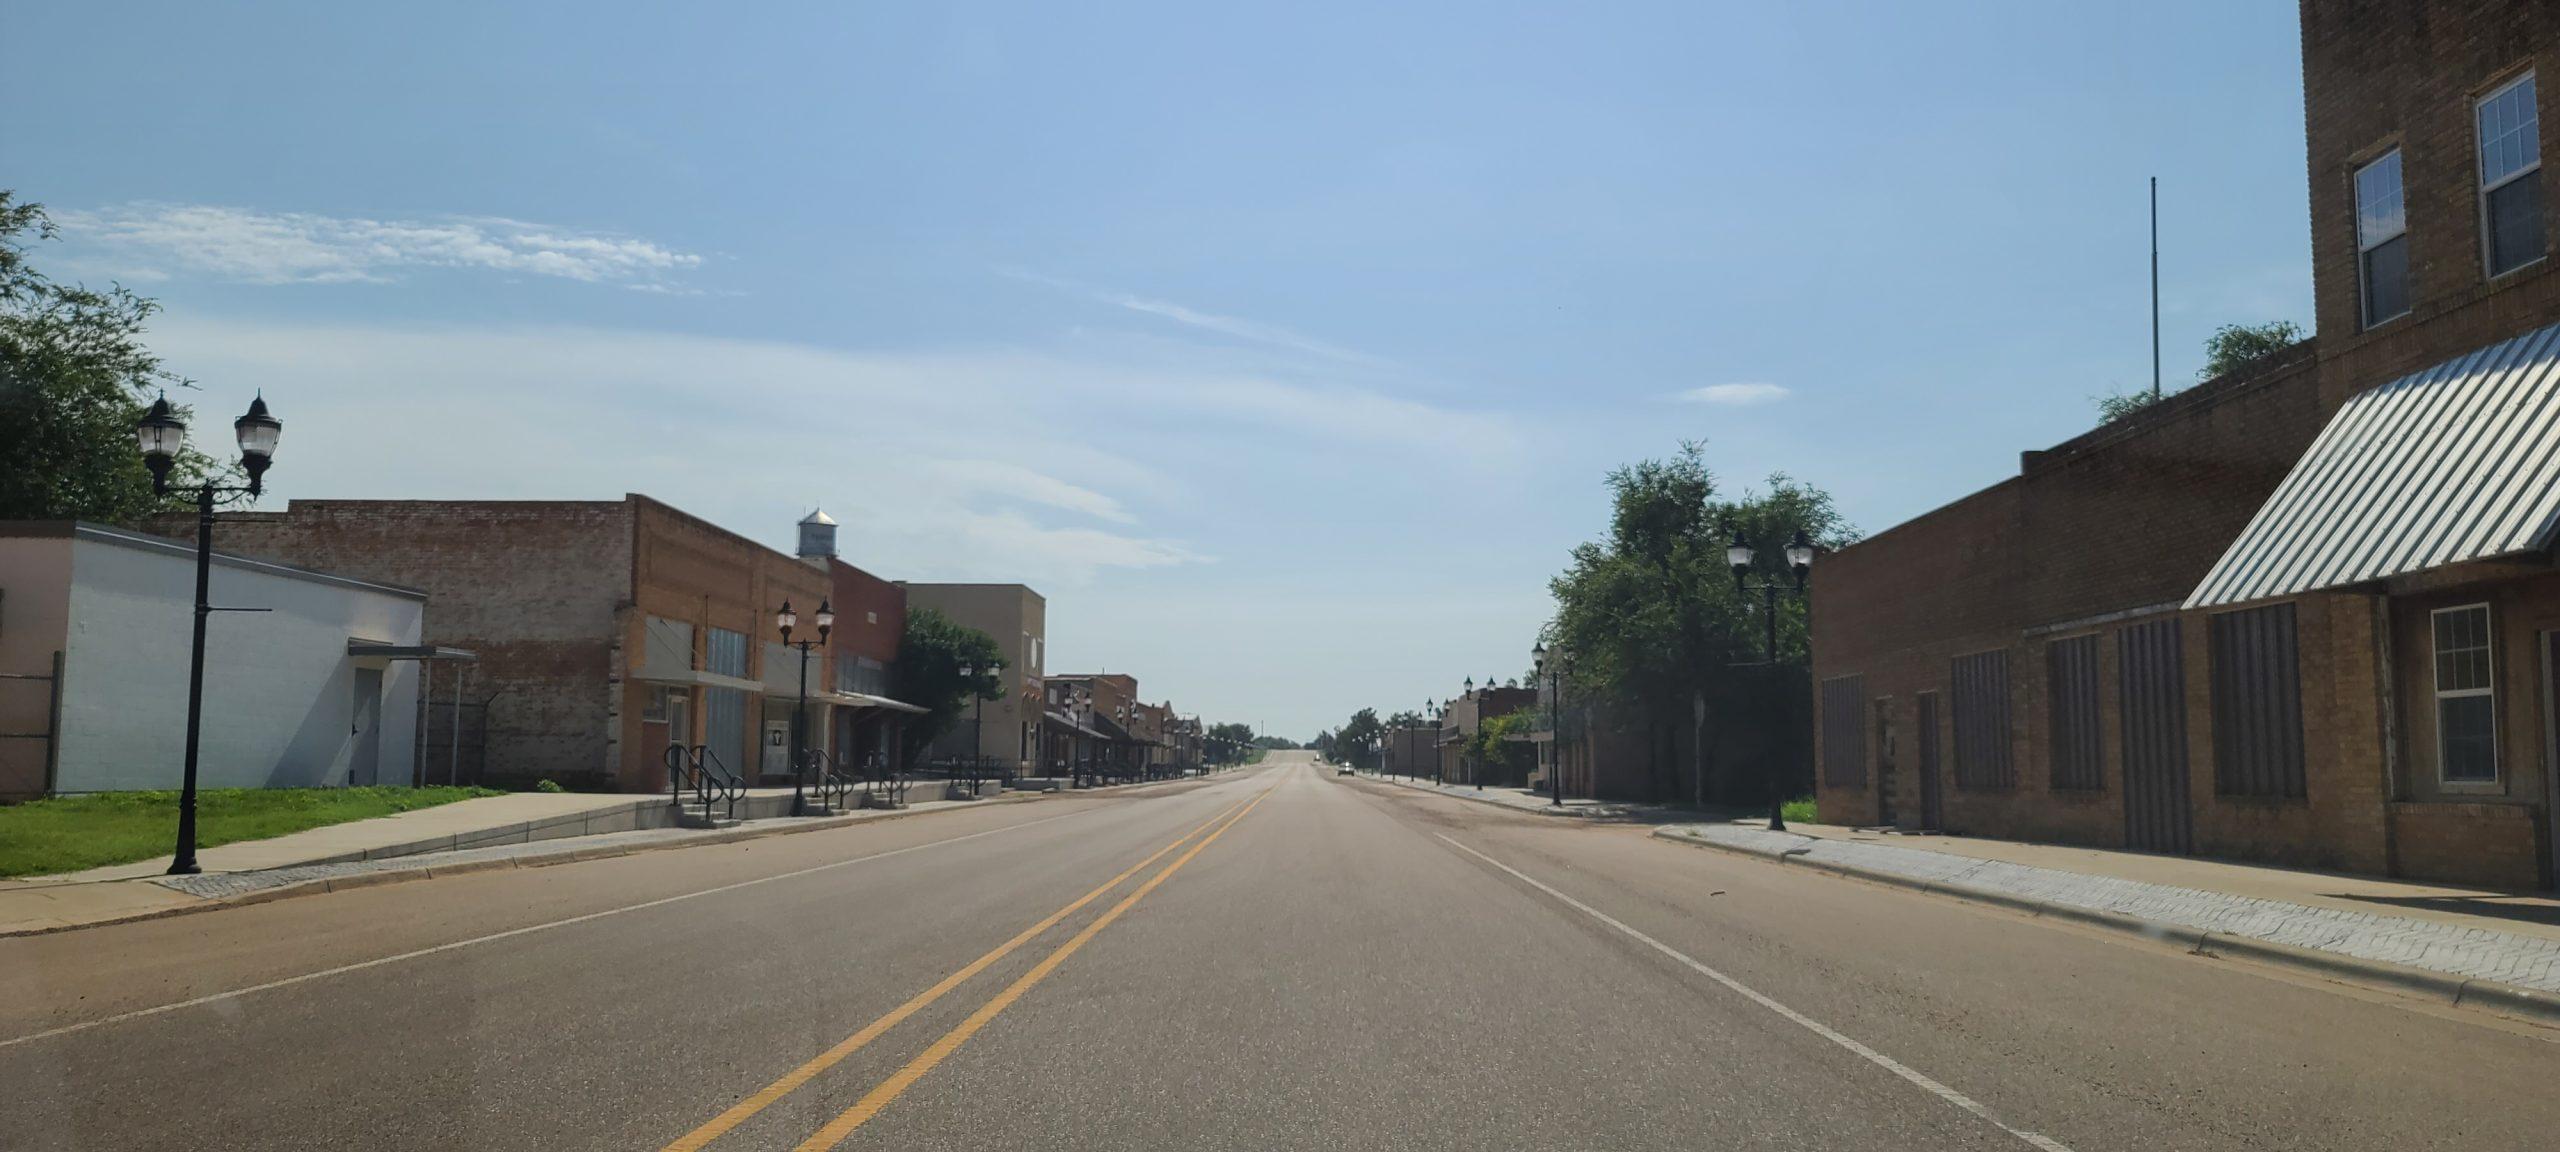 Main street in Turkey, Texas